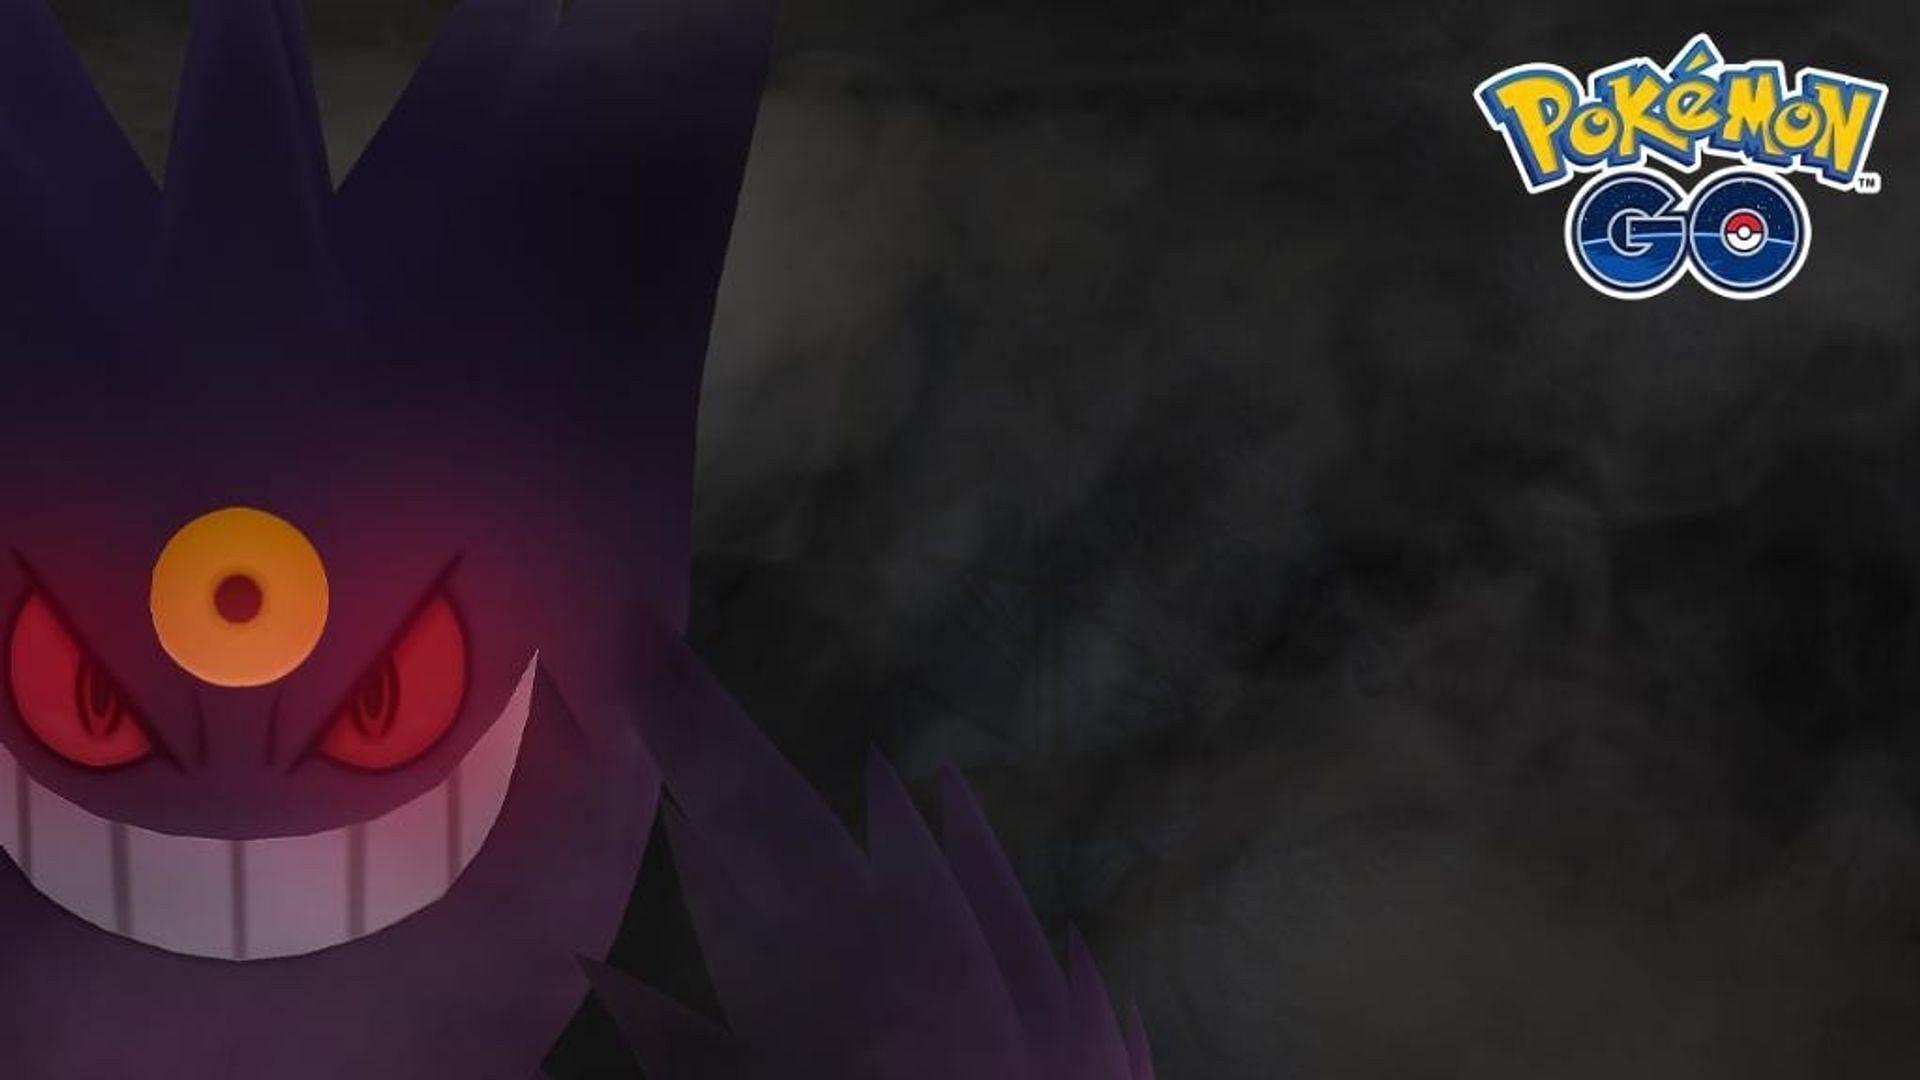 Gengar's Mega Evolution as it appears in Pokemon GO's promotional artwork (Image via Niantic)